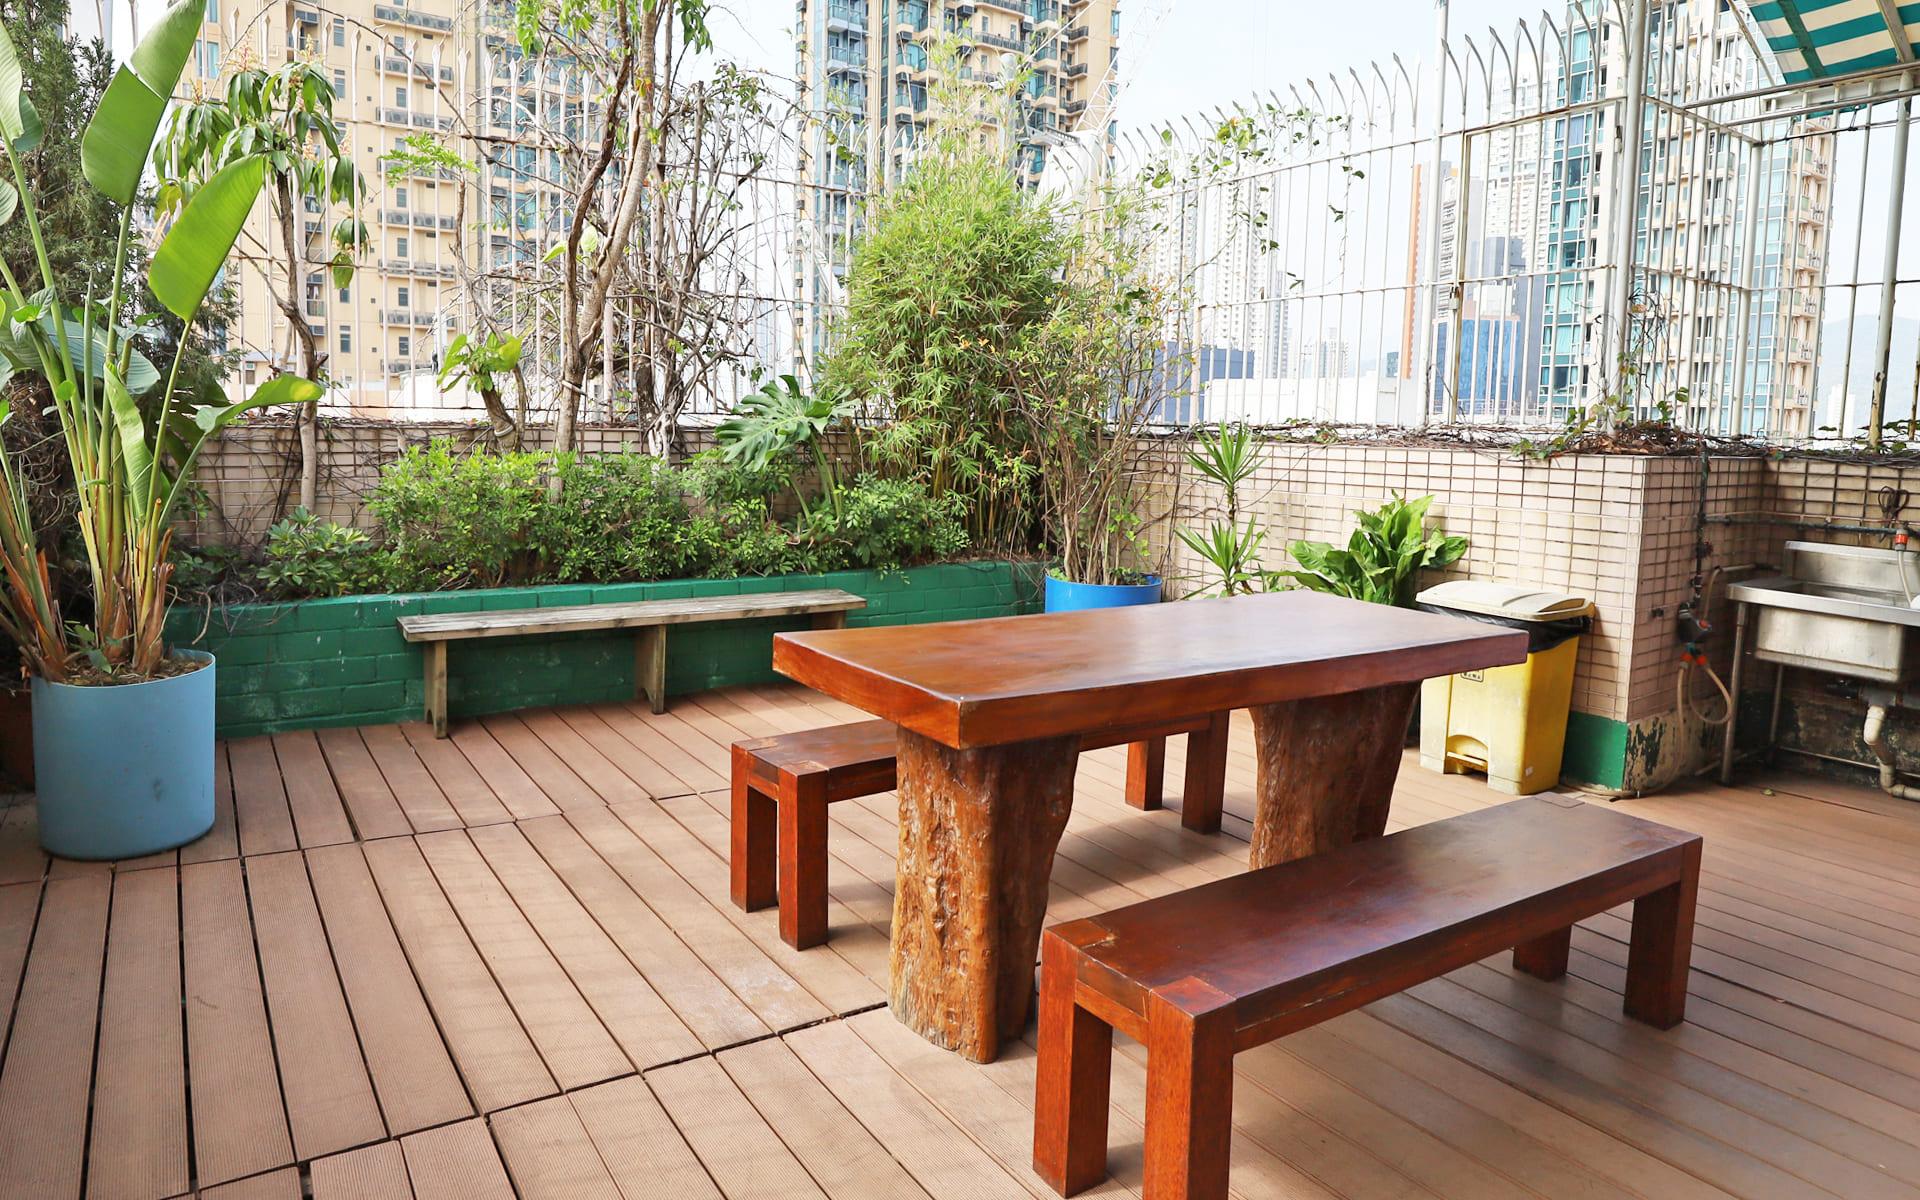 hk_service_apartment_19599834431580739653.jpg